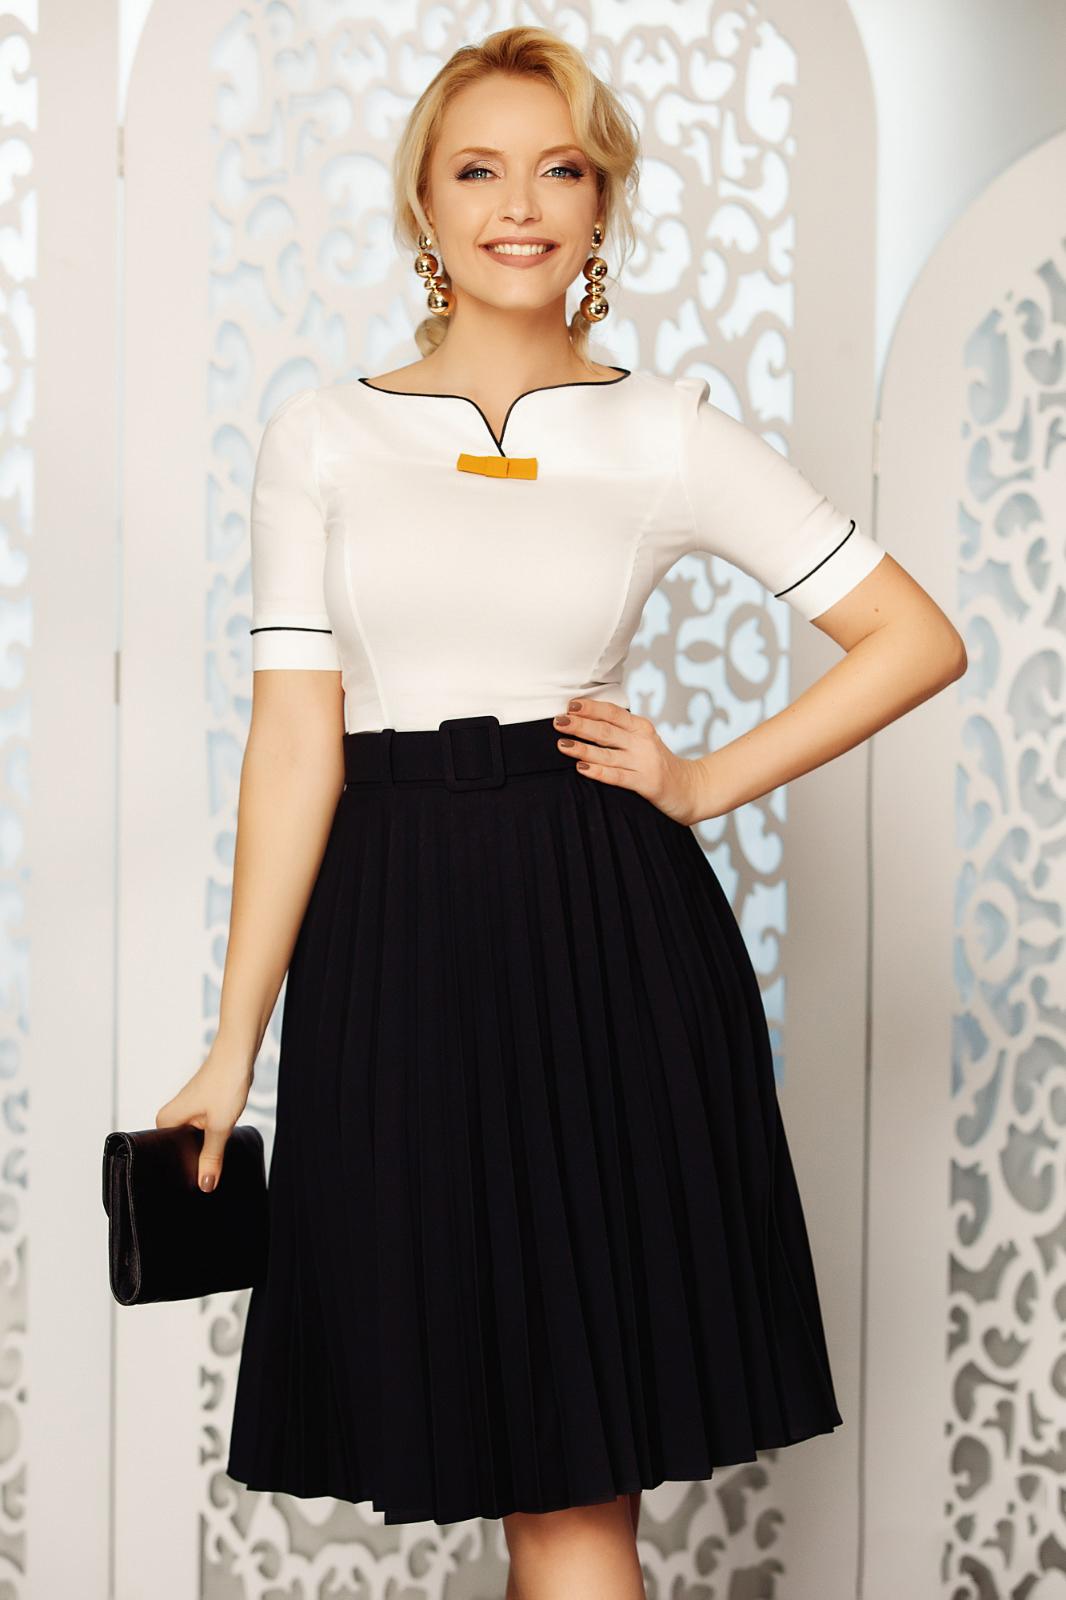 Fofy black elegant folded up cloche skirt high waisted accessorized with belt slightly elastic fabric